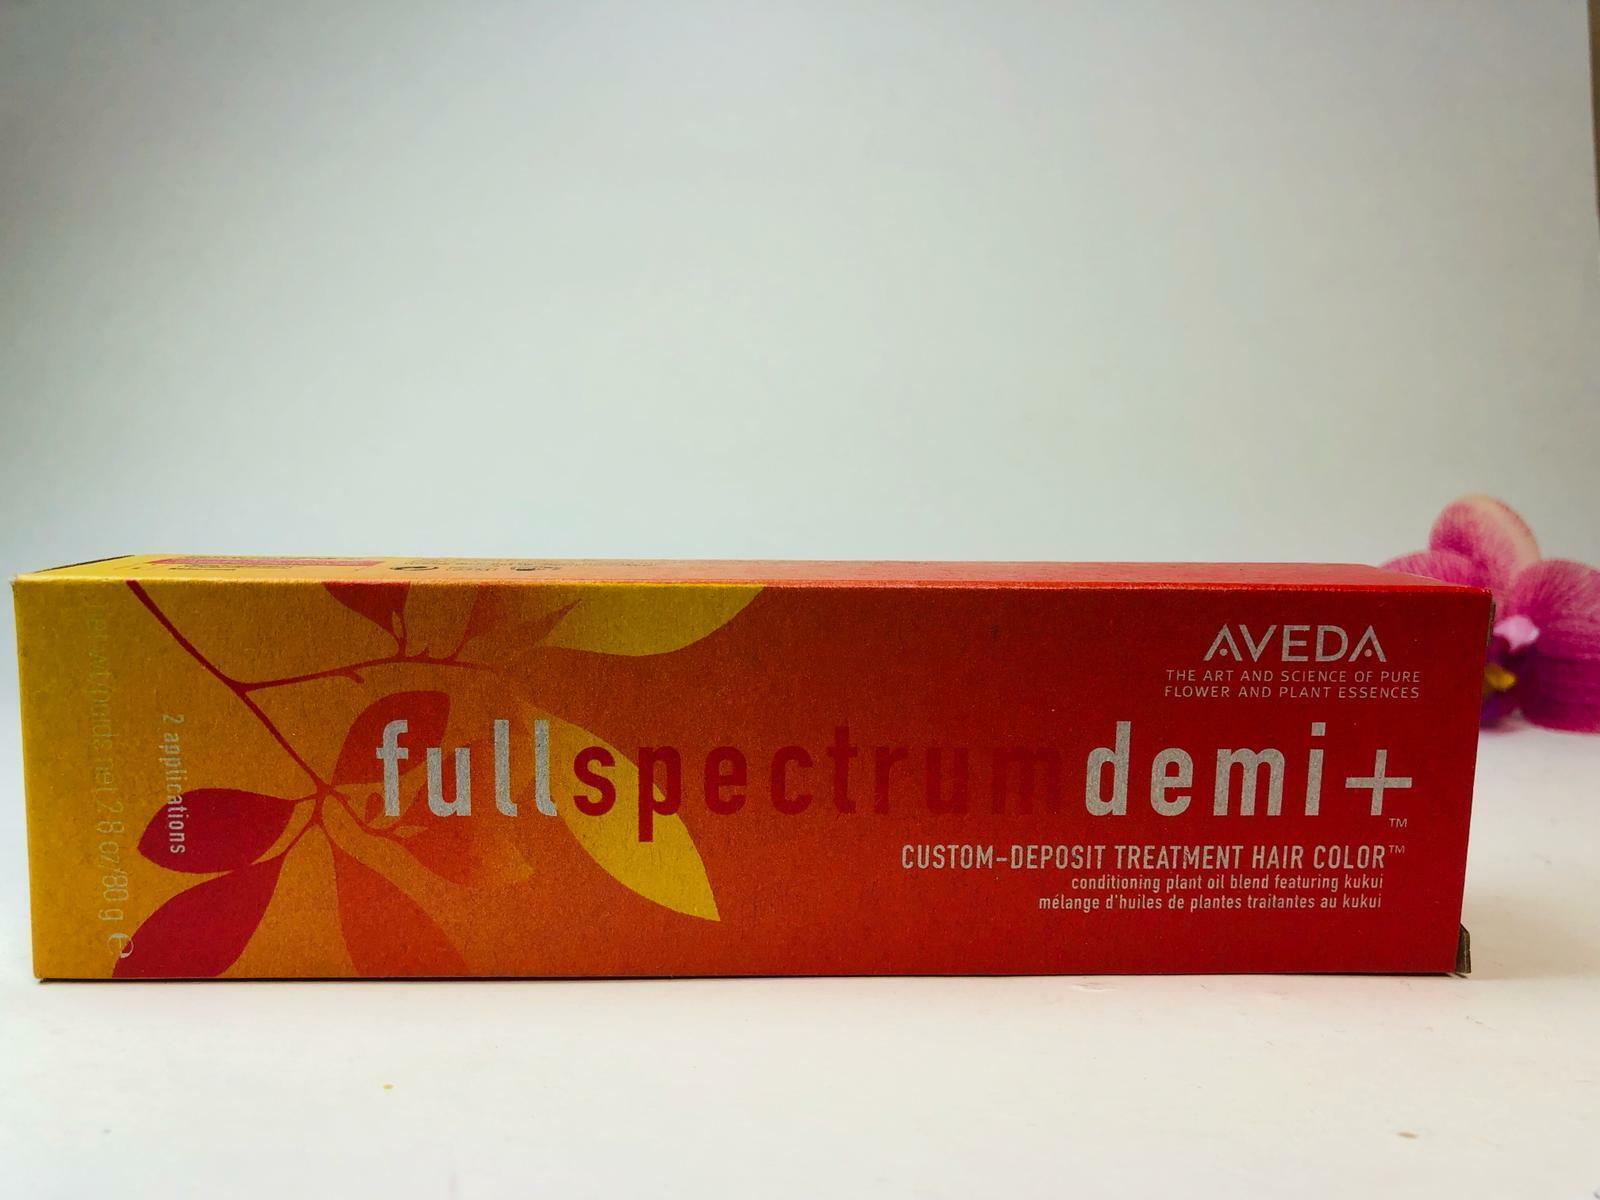 Aveda Full Spectrum Demi+ Custom-Deposit Treatment Hair Colo